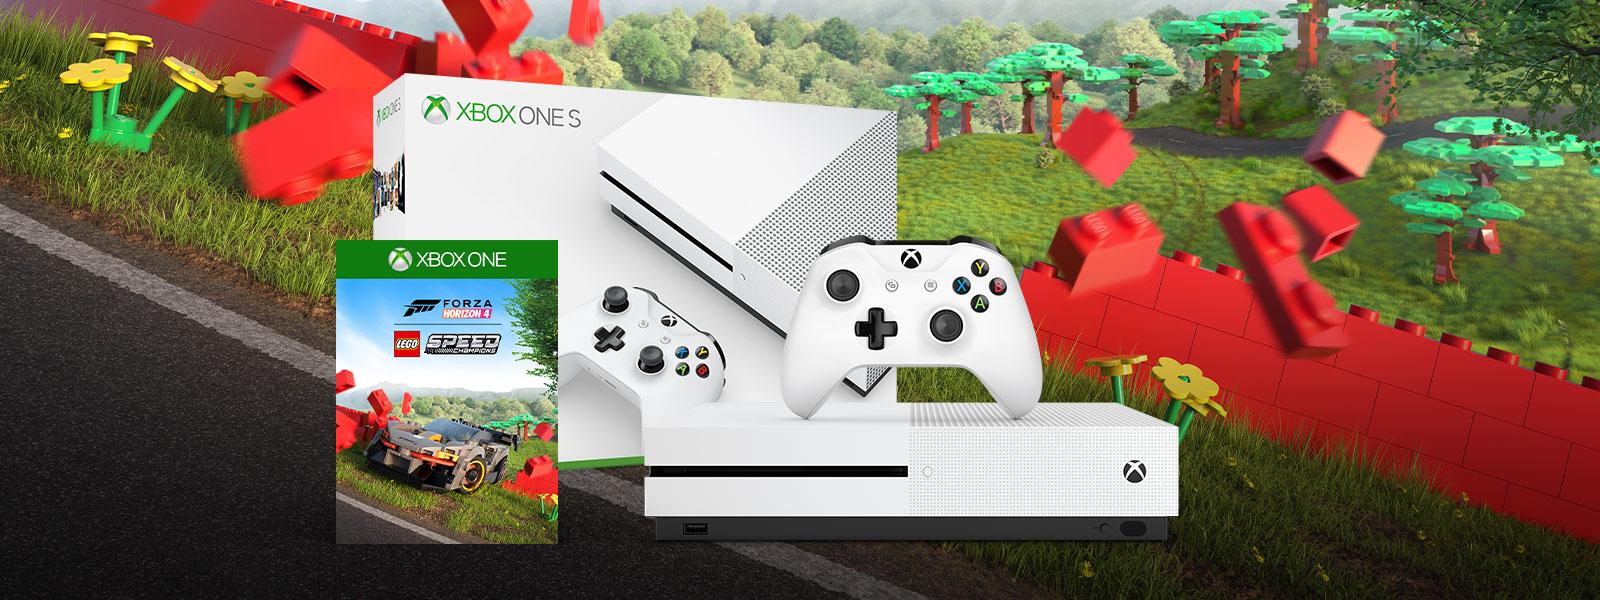 Xbox One S Forza Horizon 4 LEGO® Speed Champions bundle art in front of Forza Horizon Lego landscape